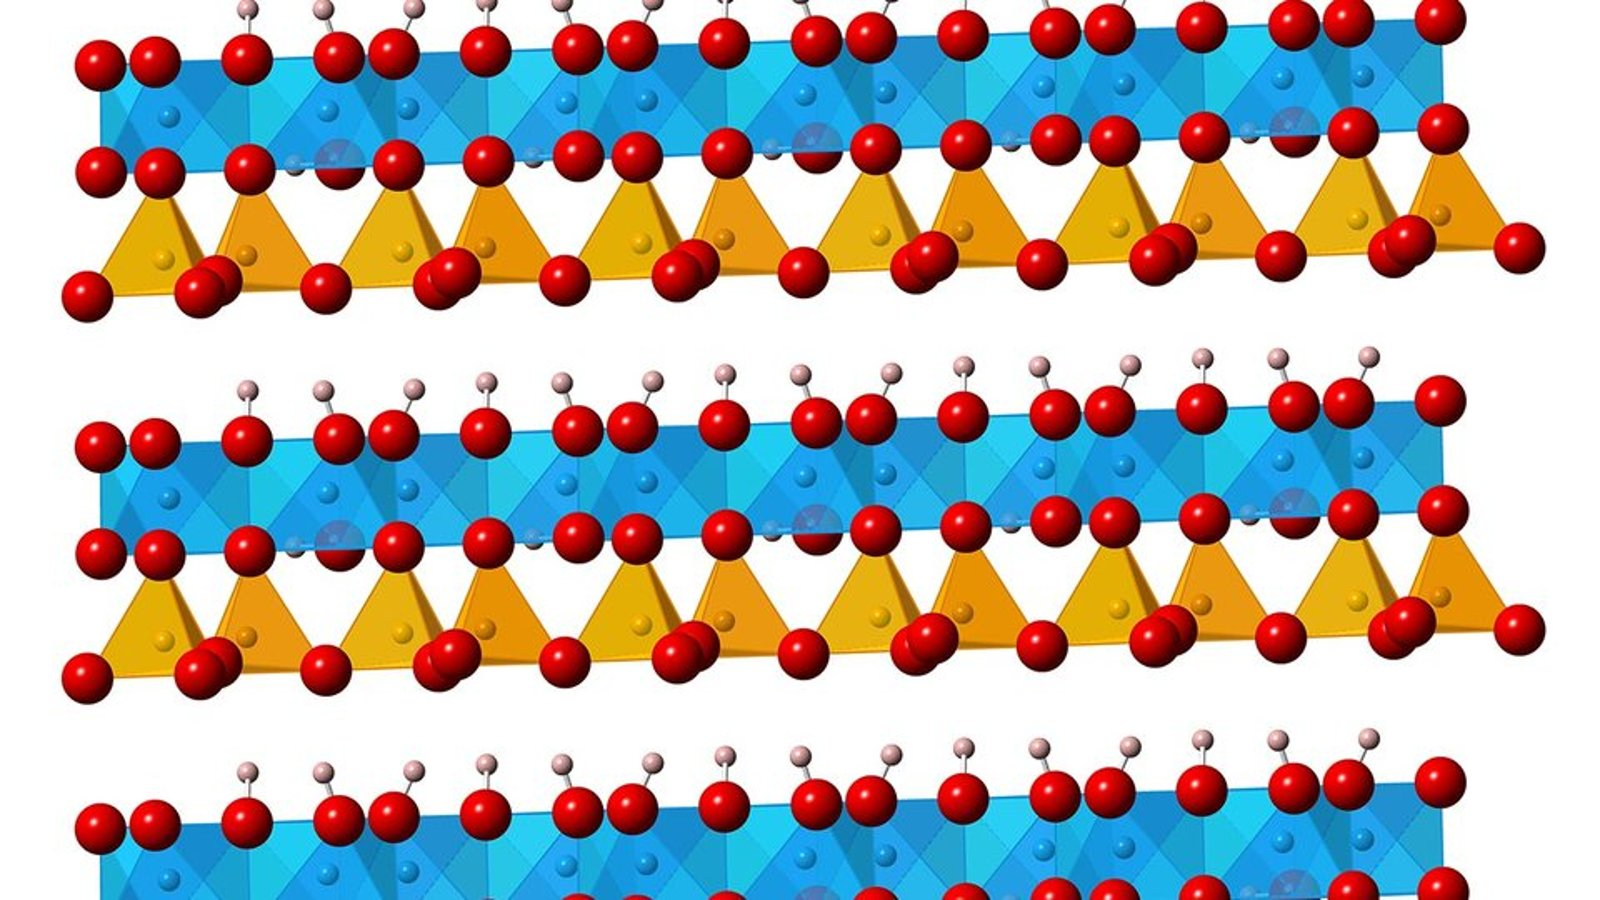 Life's Origins and DNA Computing